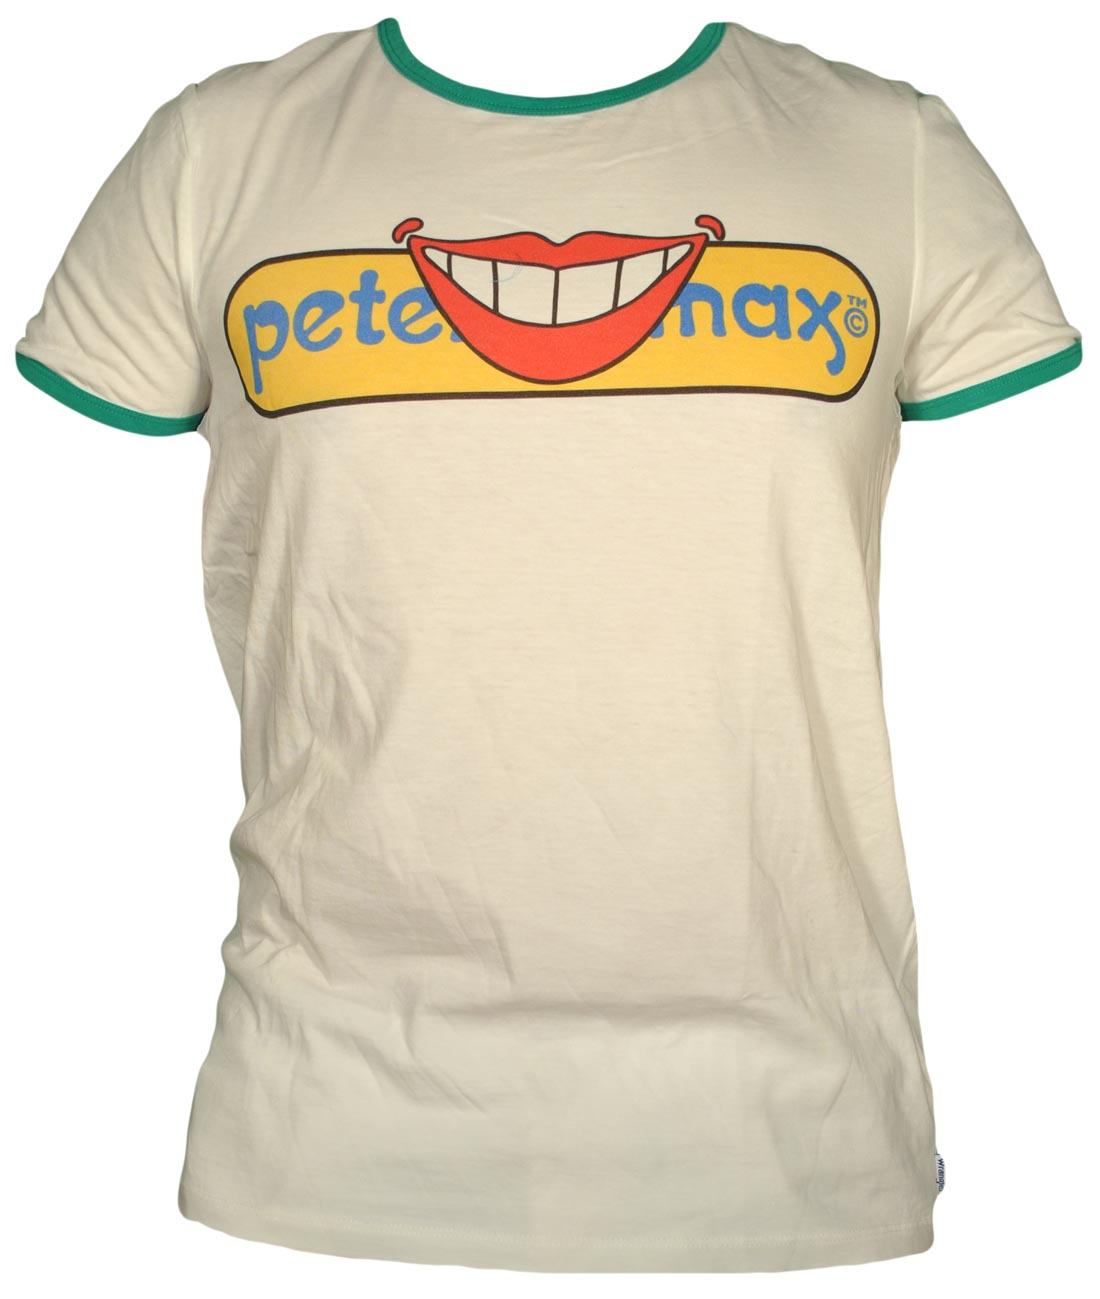 WRANGER PETER MAX t-shirt męski SMILE TEE _ M 38